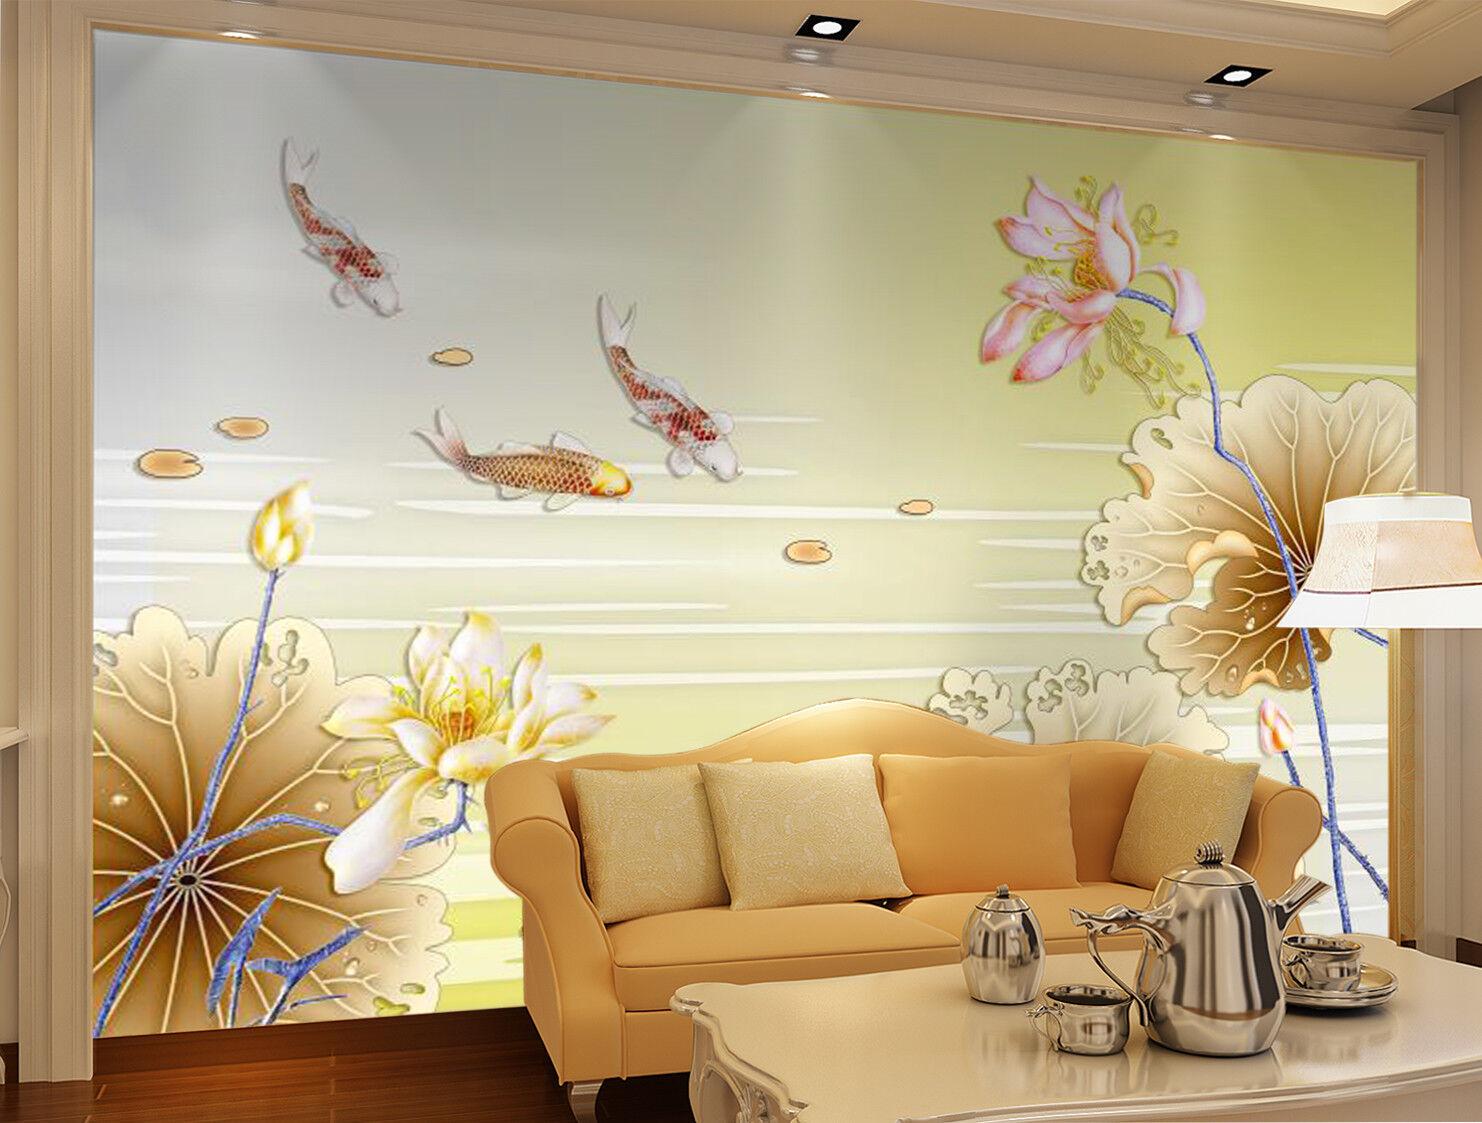 3D Teichlotusblatt Fisch 57 Tapete Tapeten Mauer Foto Familie Tapete Wandgemälde